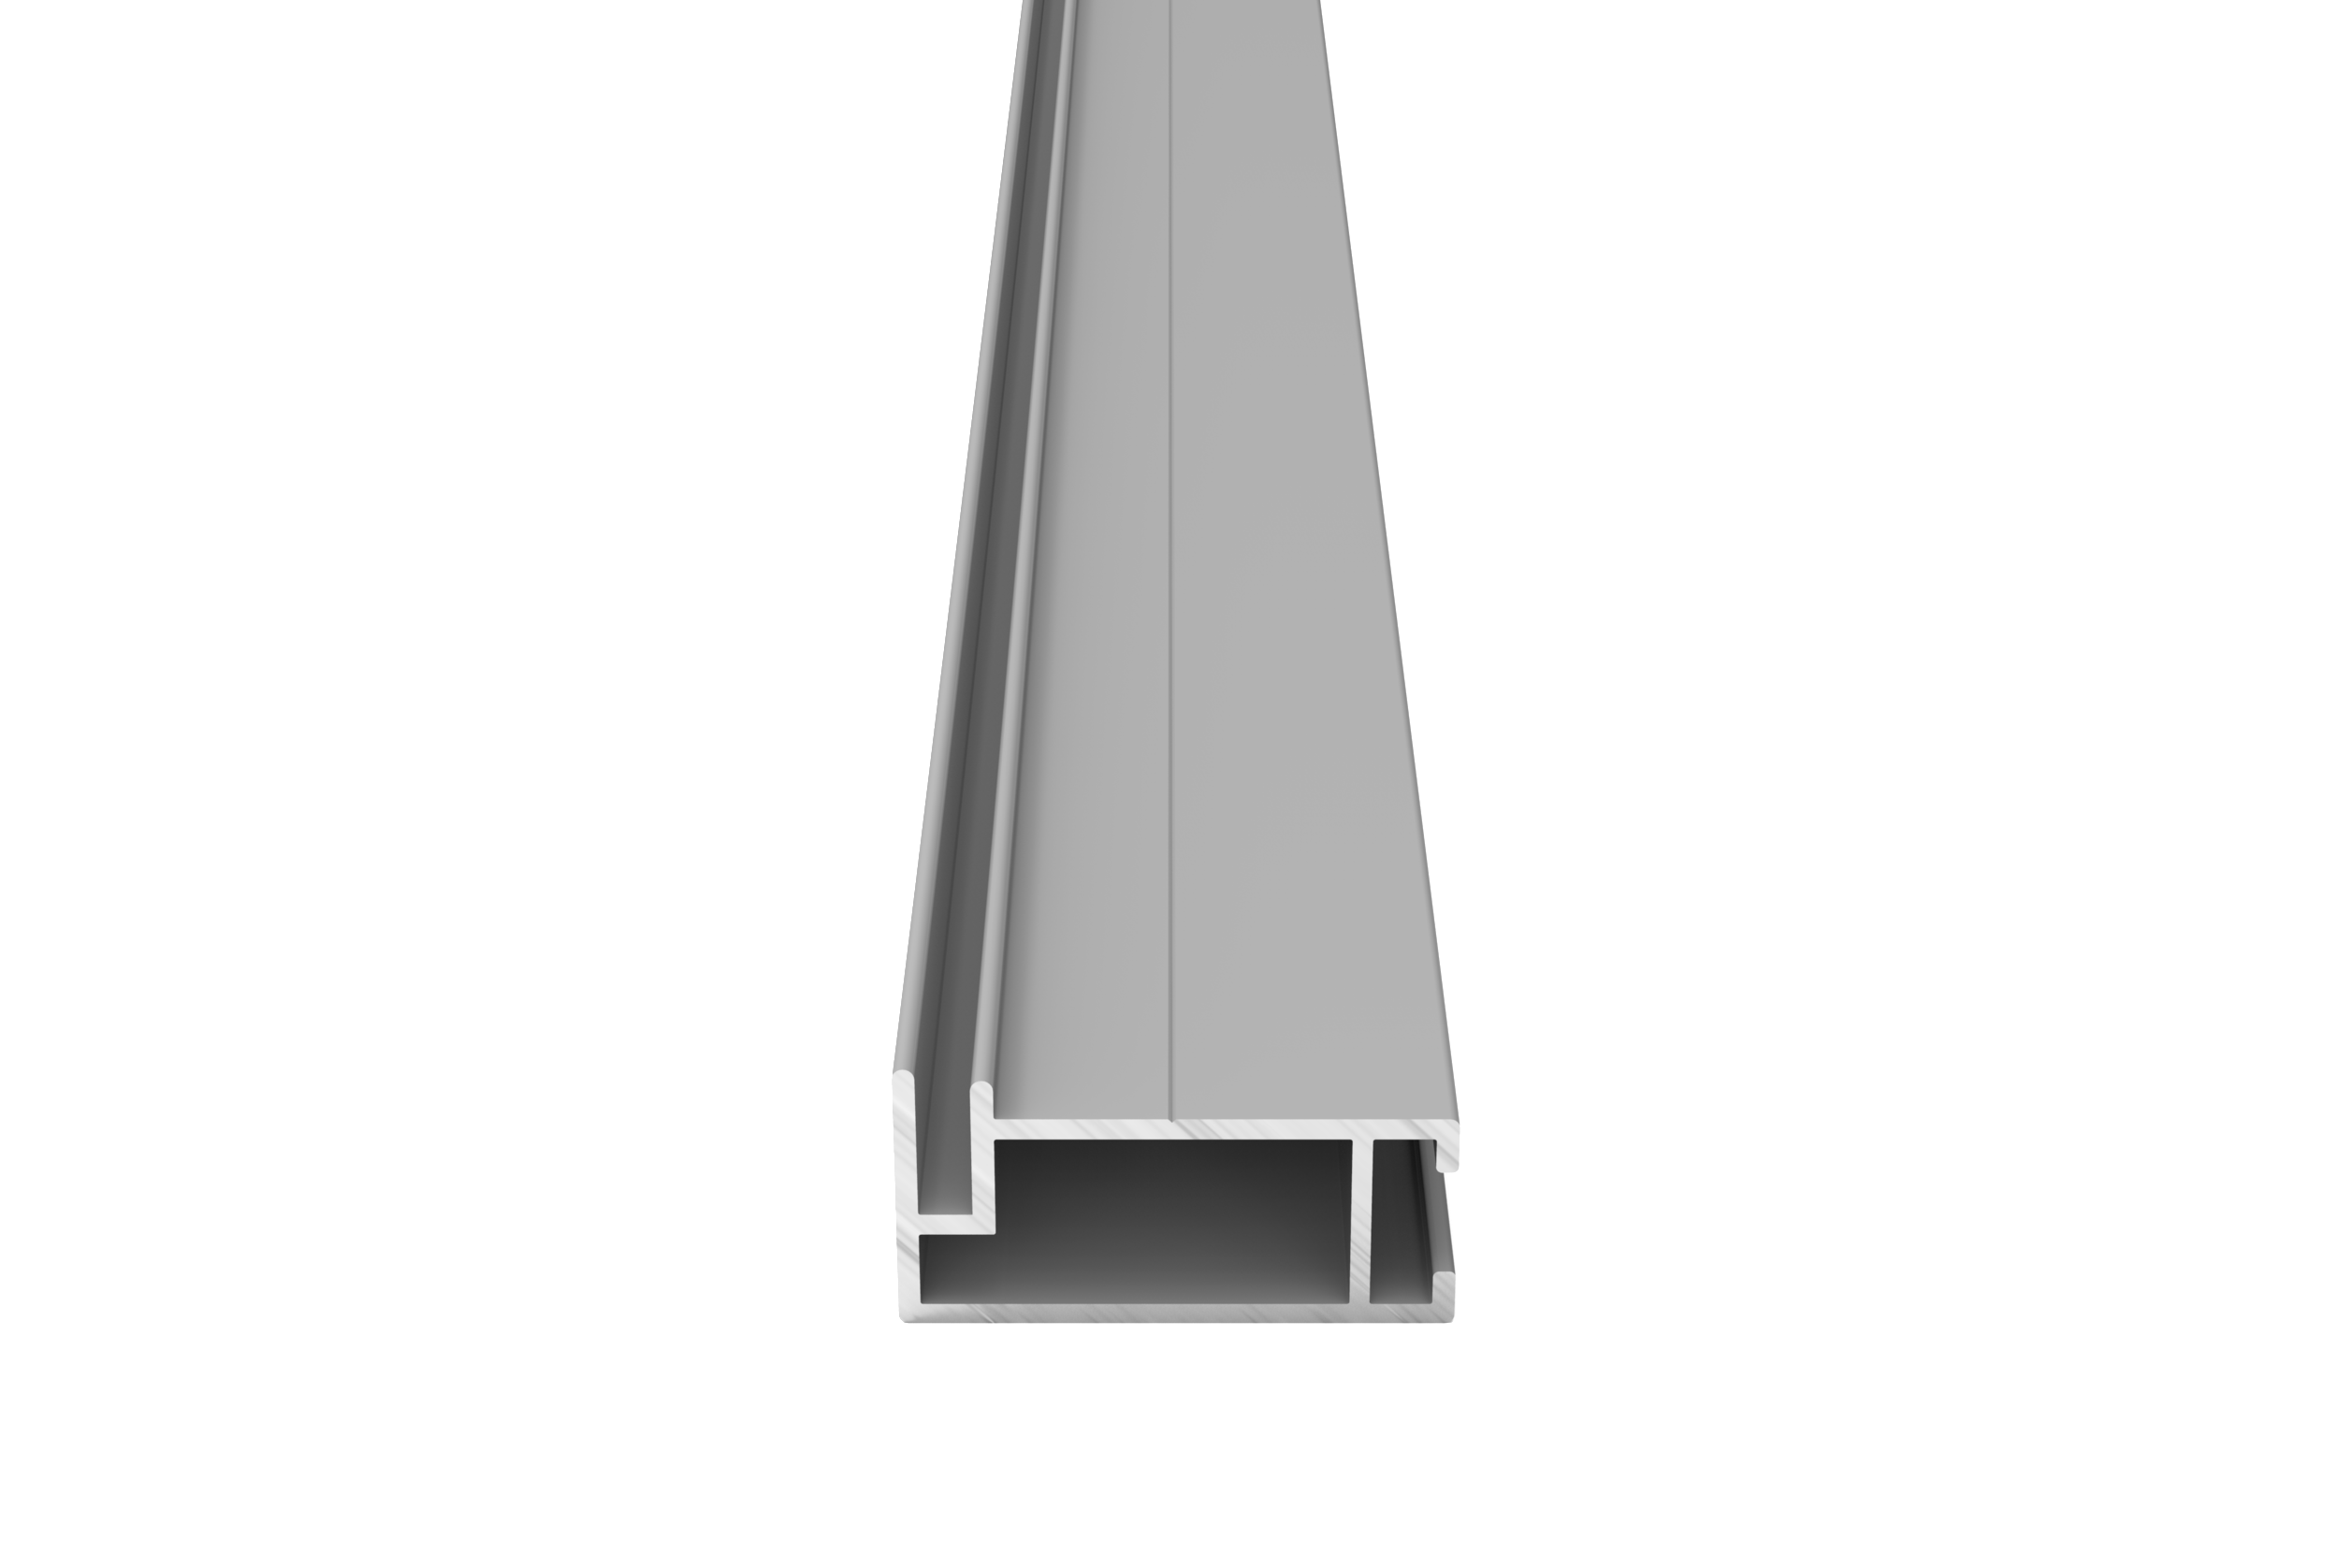 Profile 23 - Single SidedVisible edge 23mm#FR-23